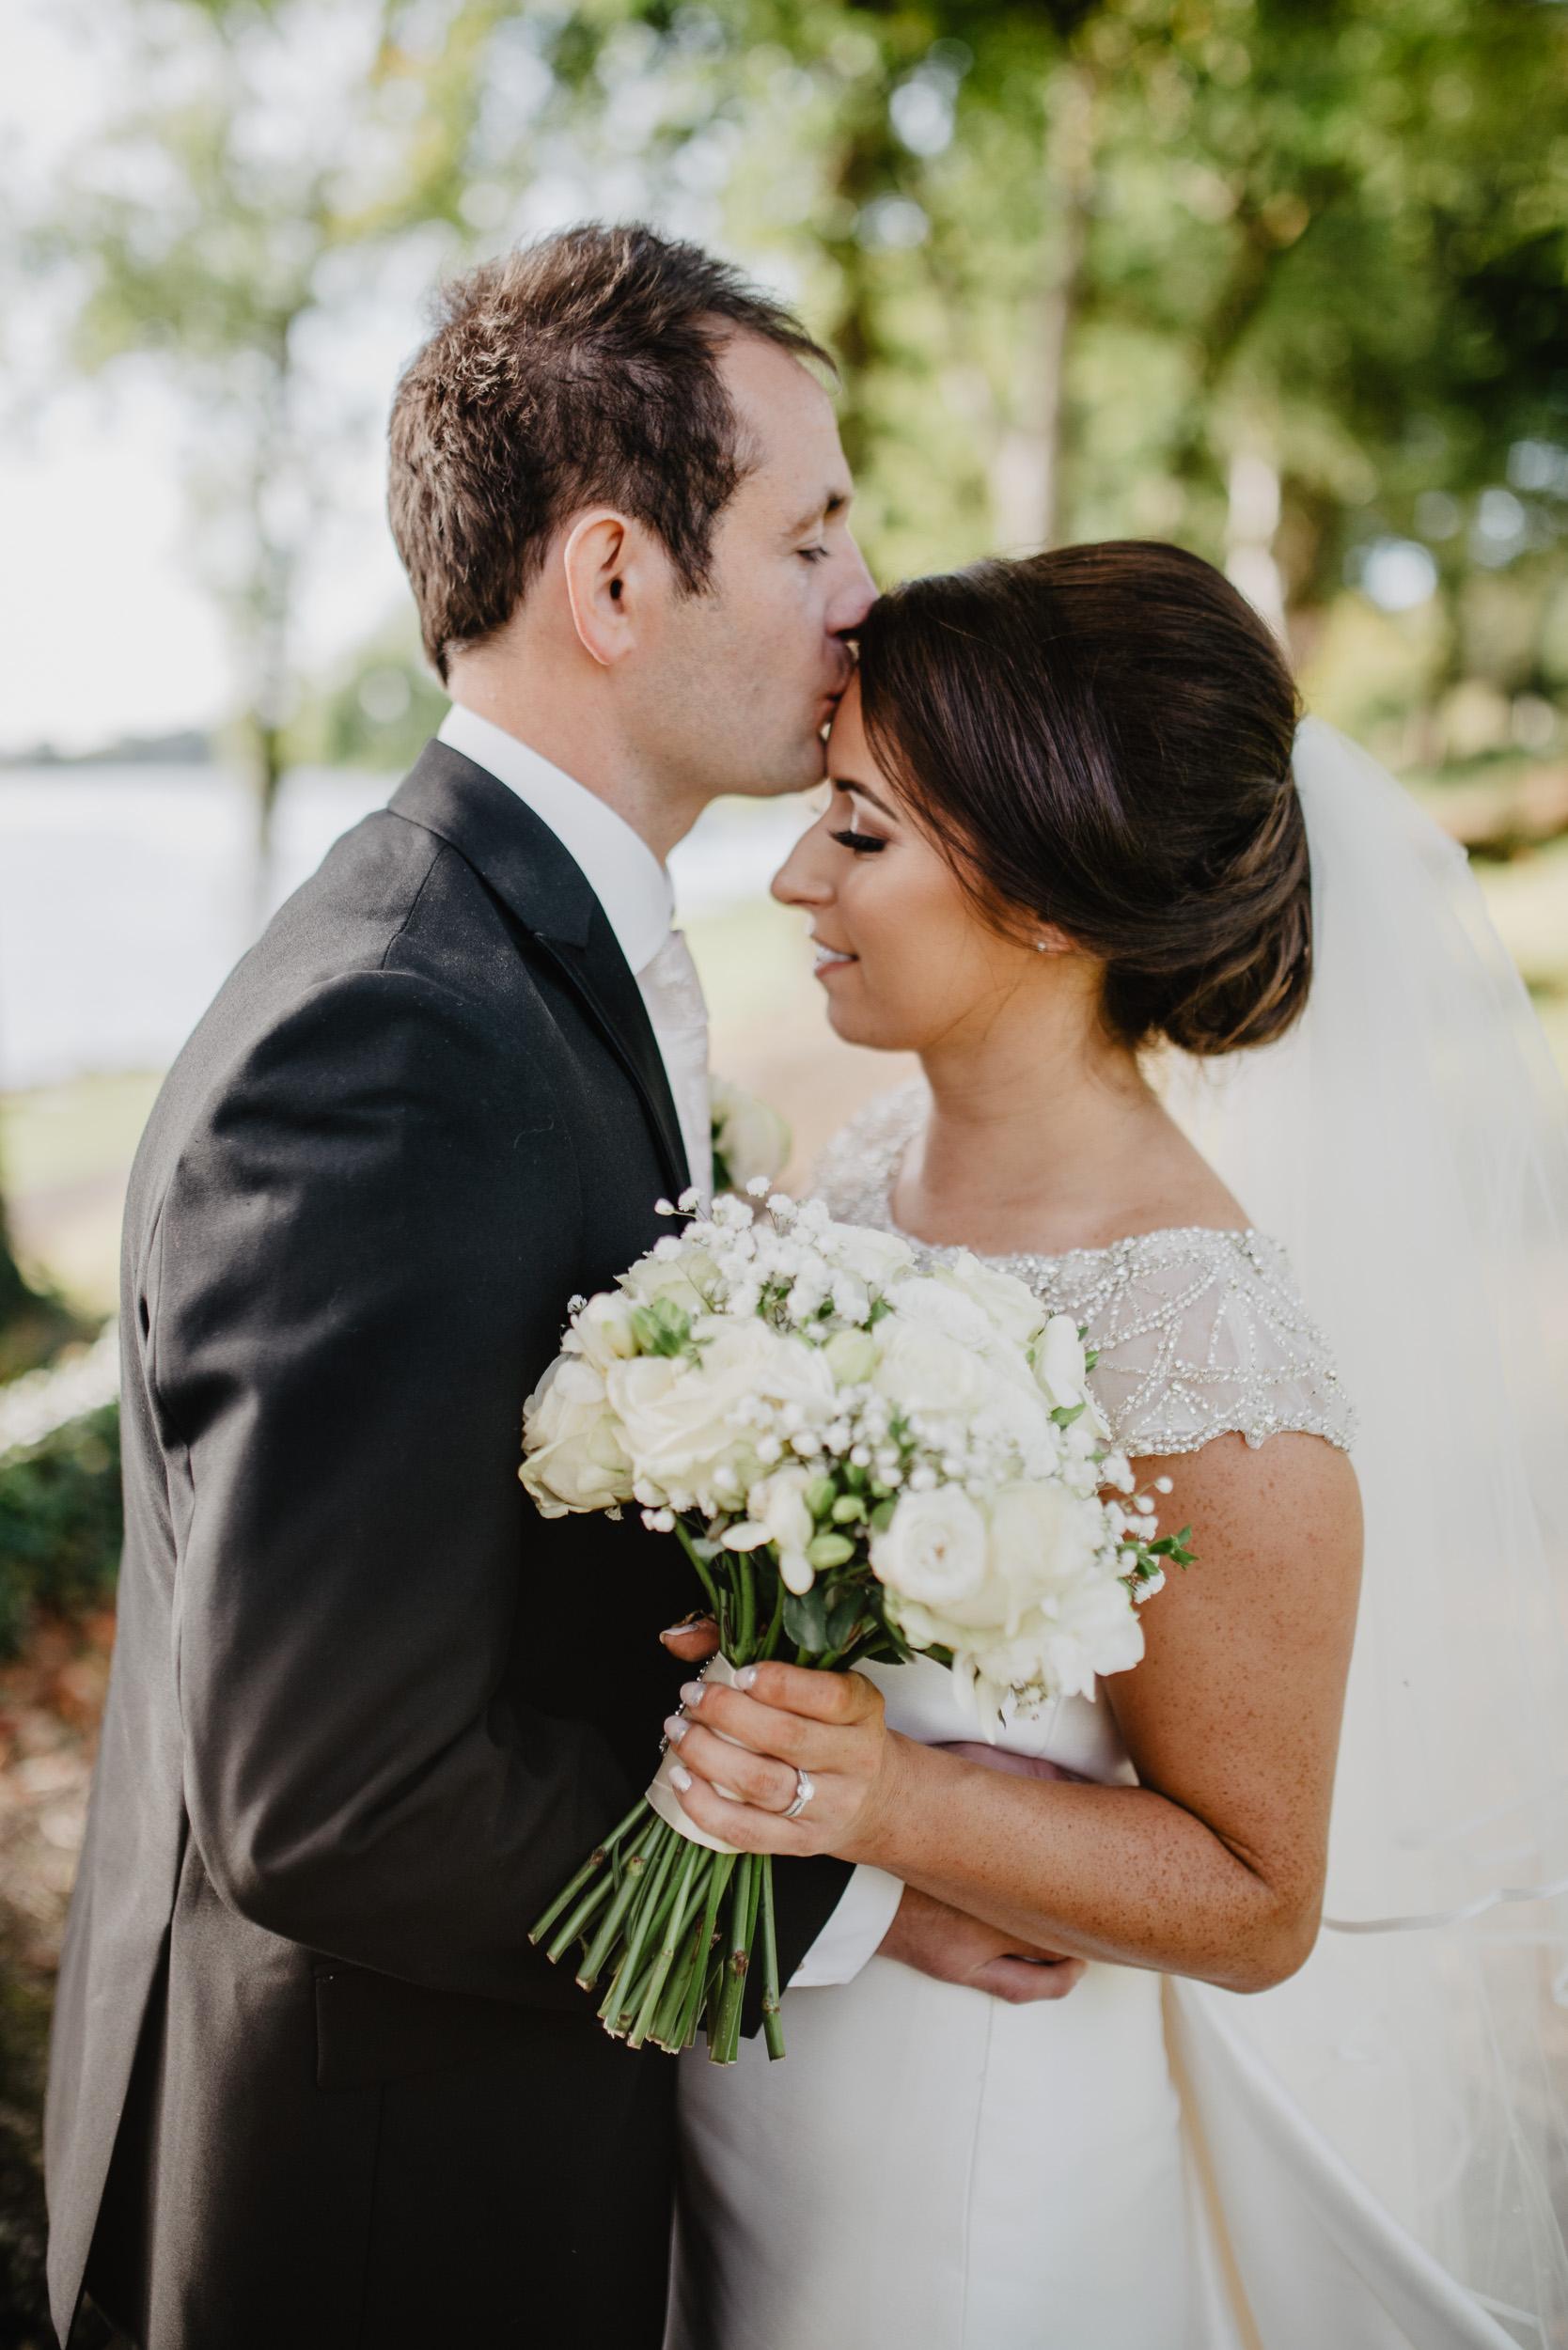 wedding photogaphy peter mackey 2018 claire-6.jpg